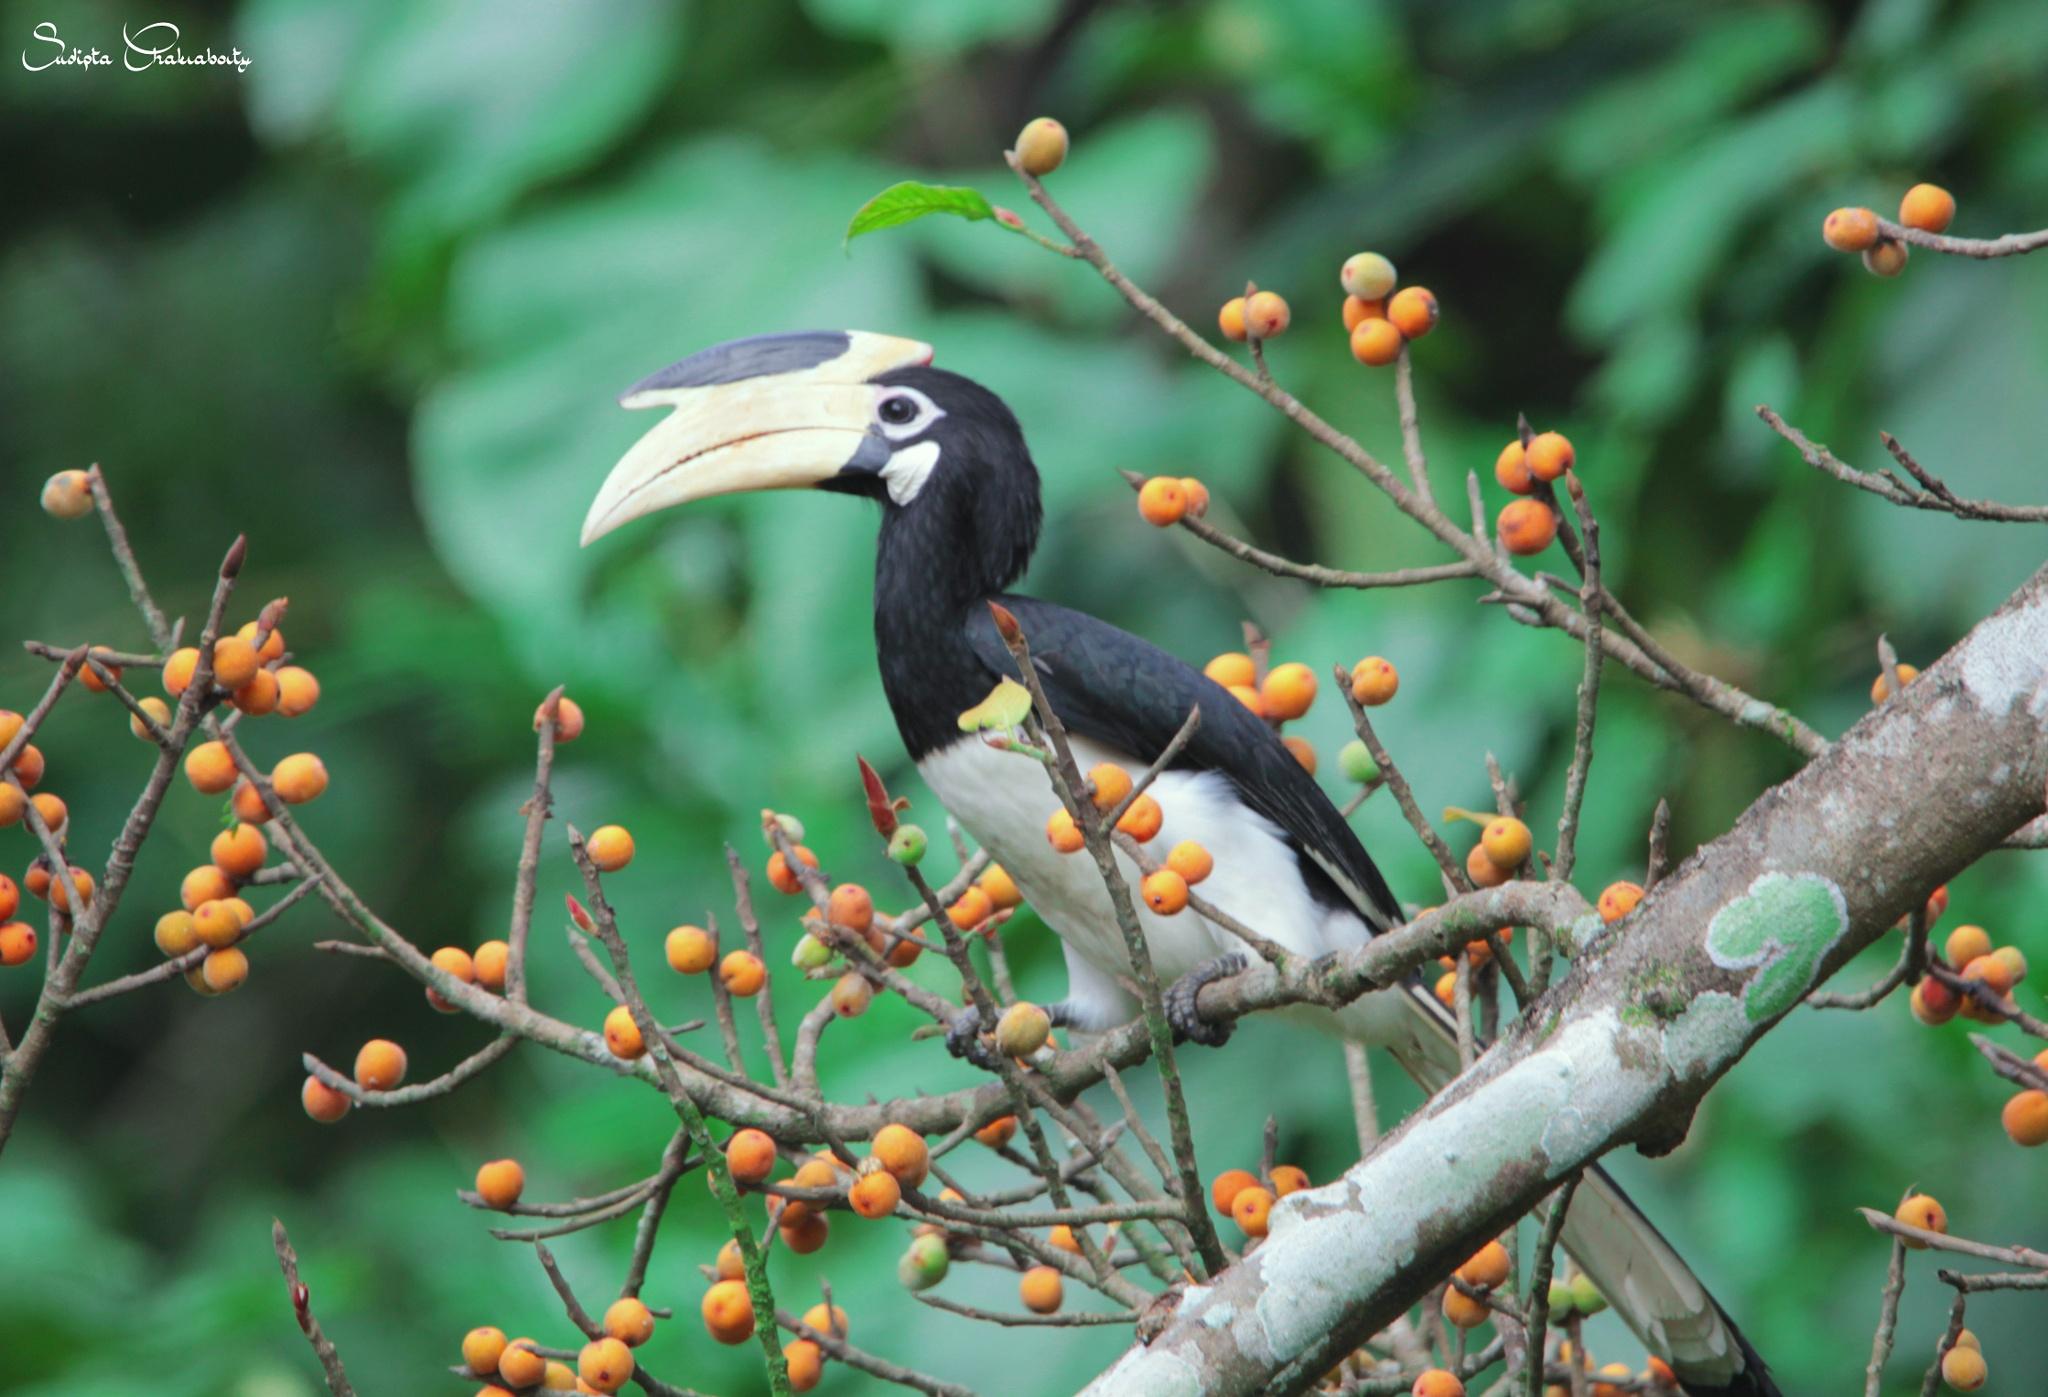 Malabar pied hornbill by sudiptachakraborty355